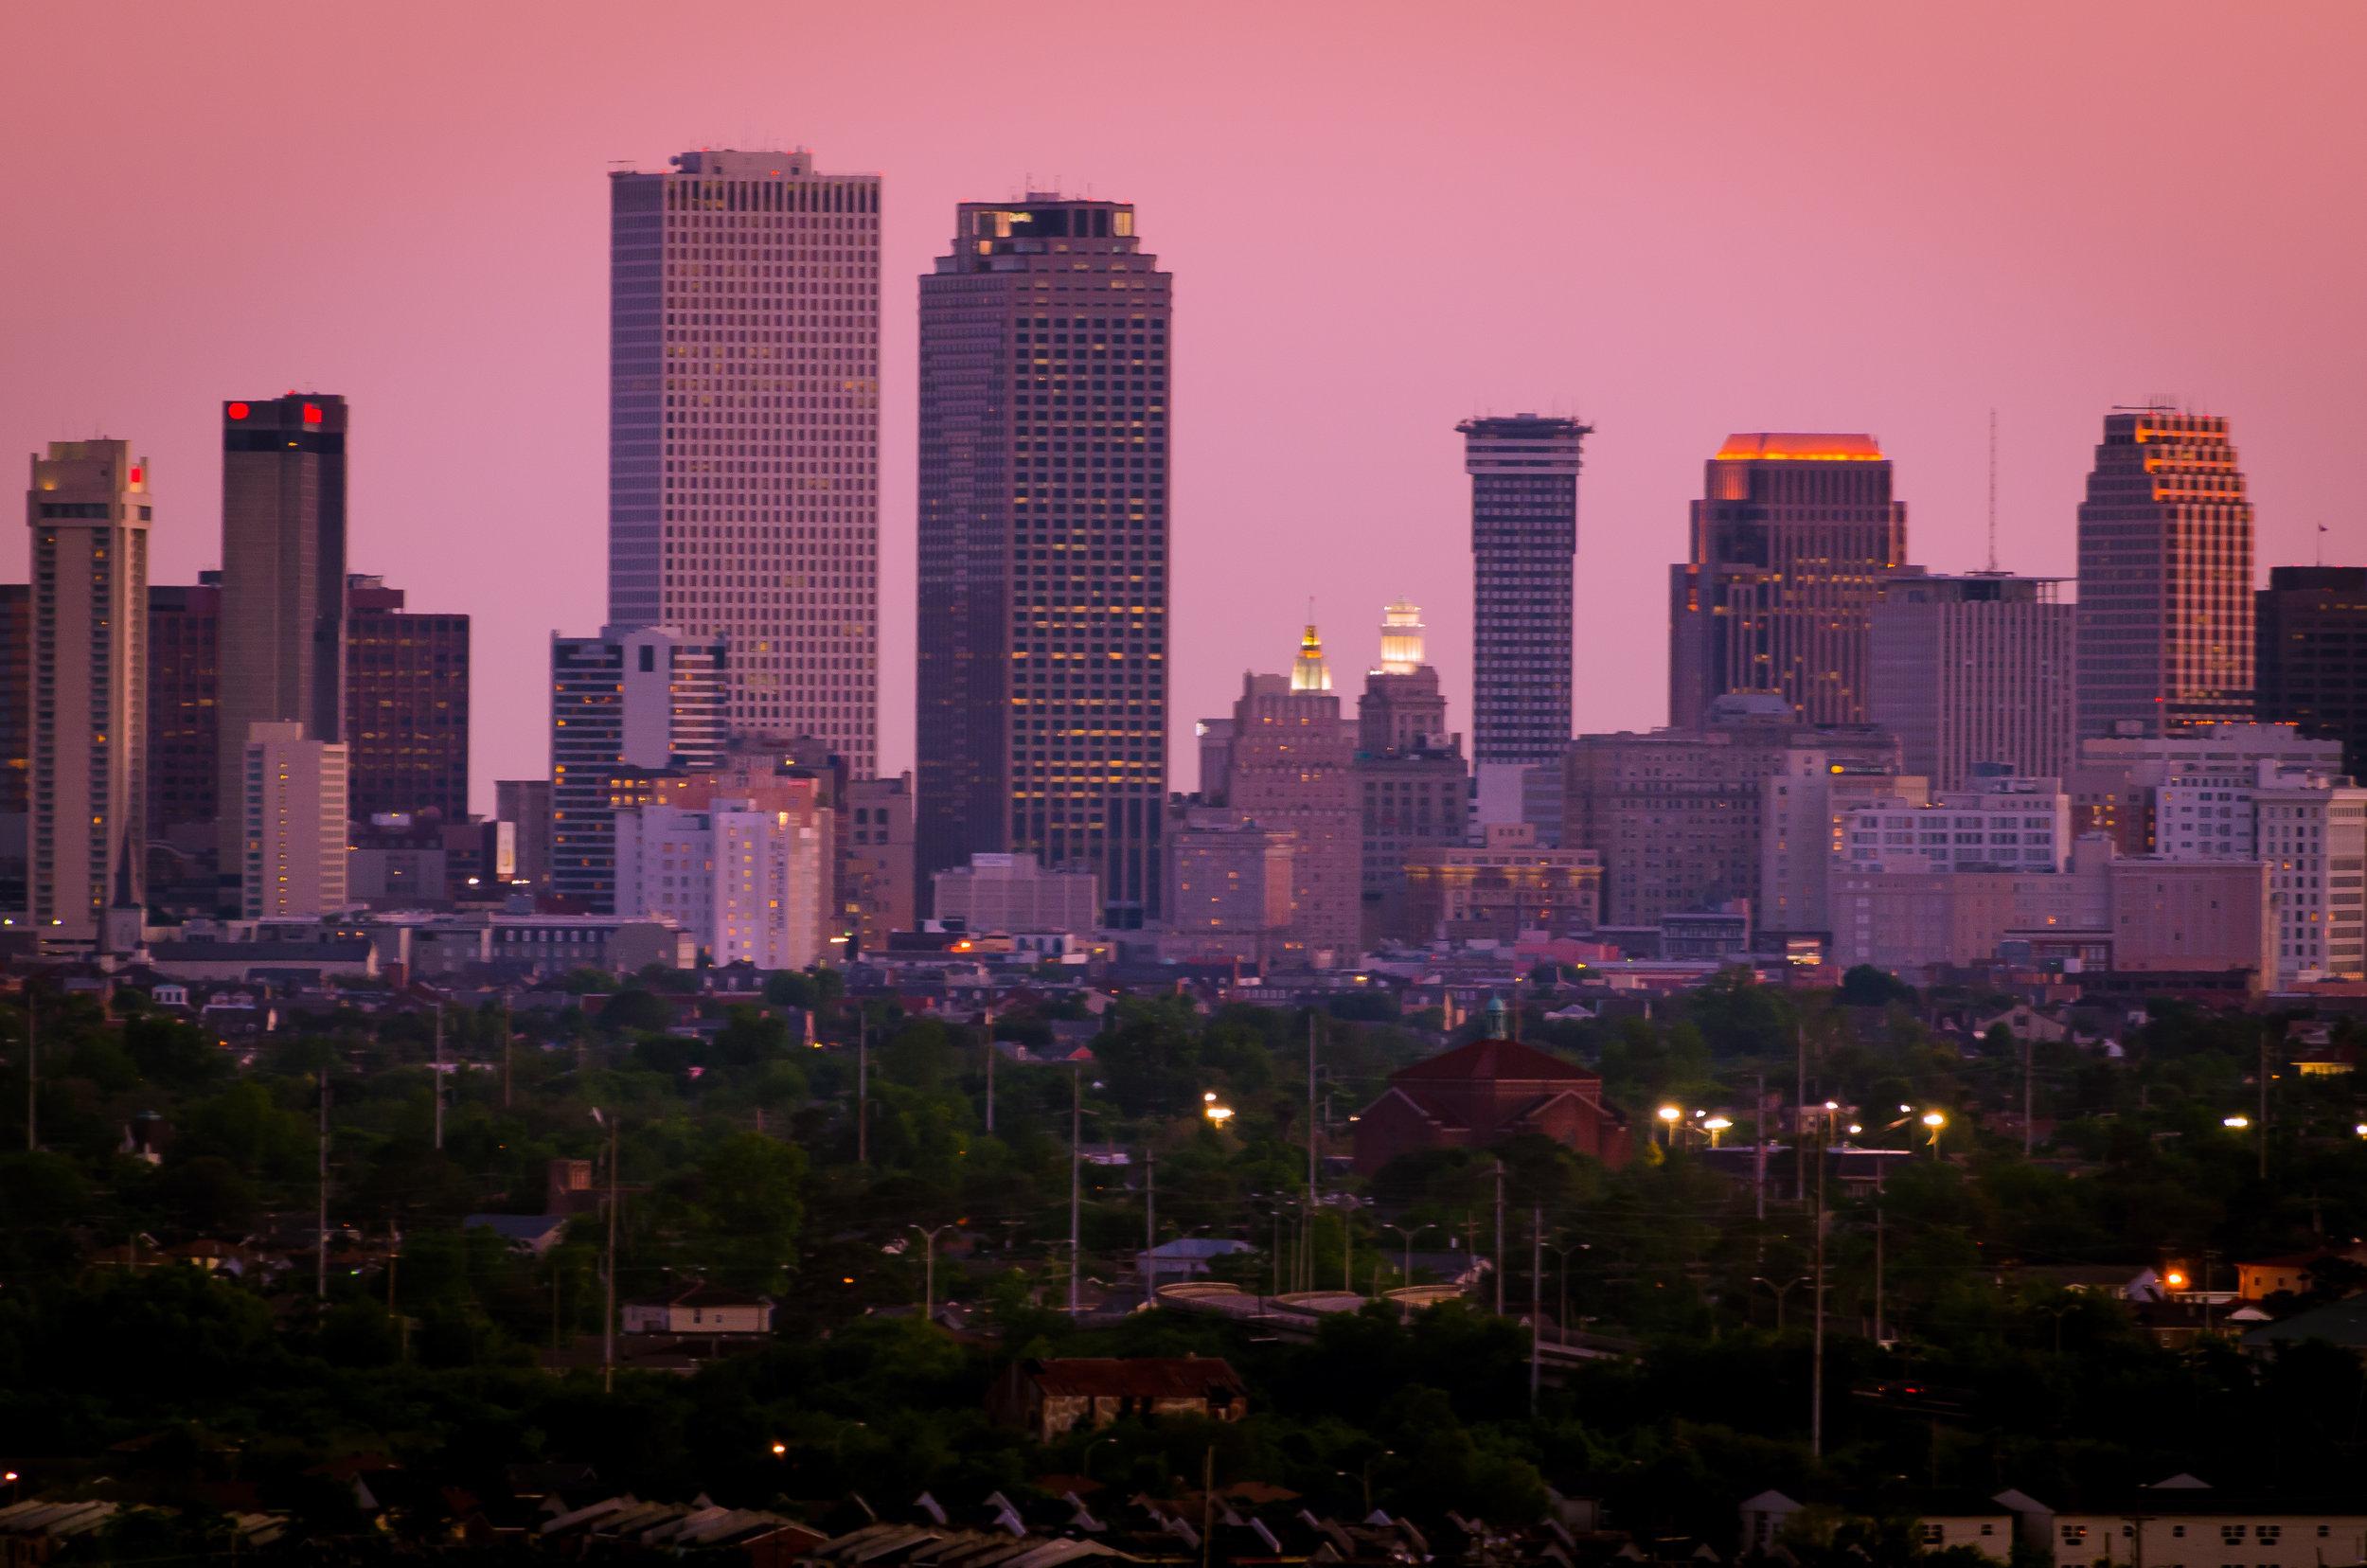 New_Orleans_skyline-02.jpg